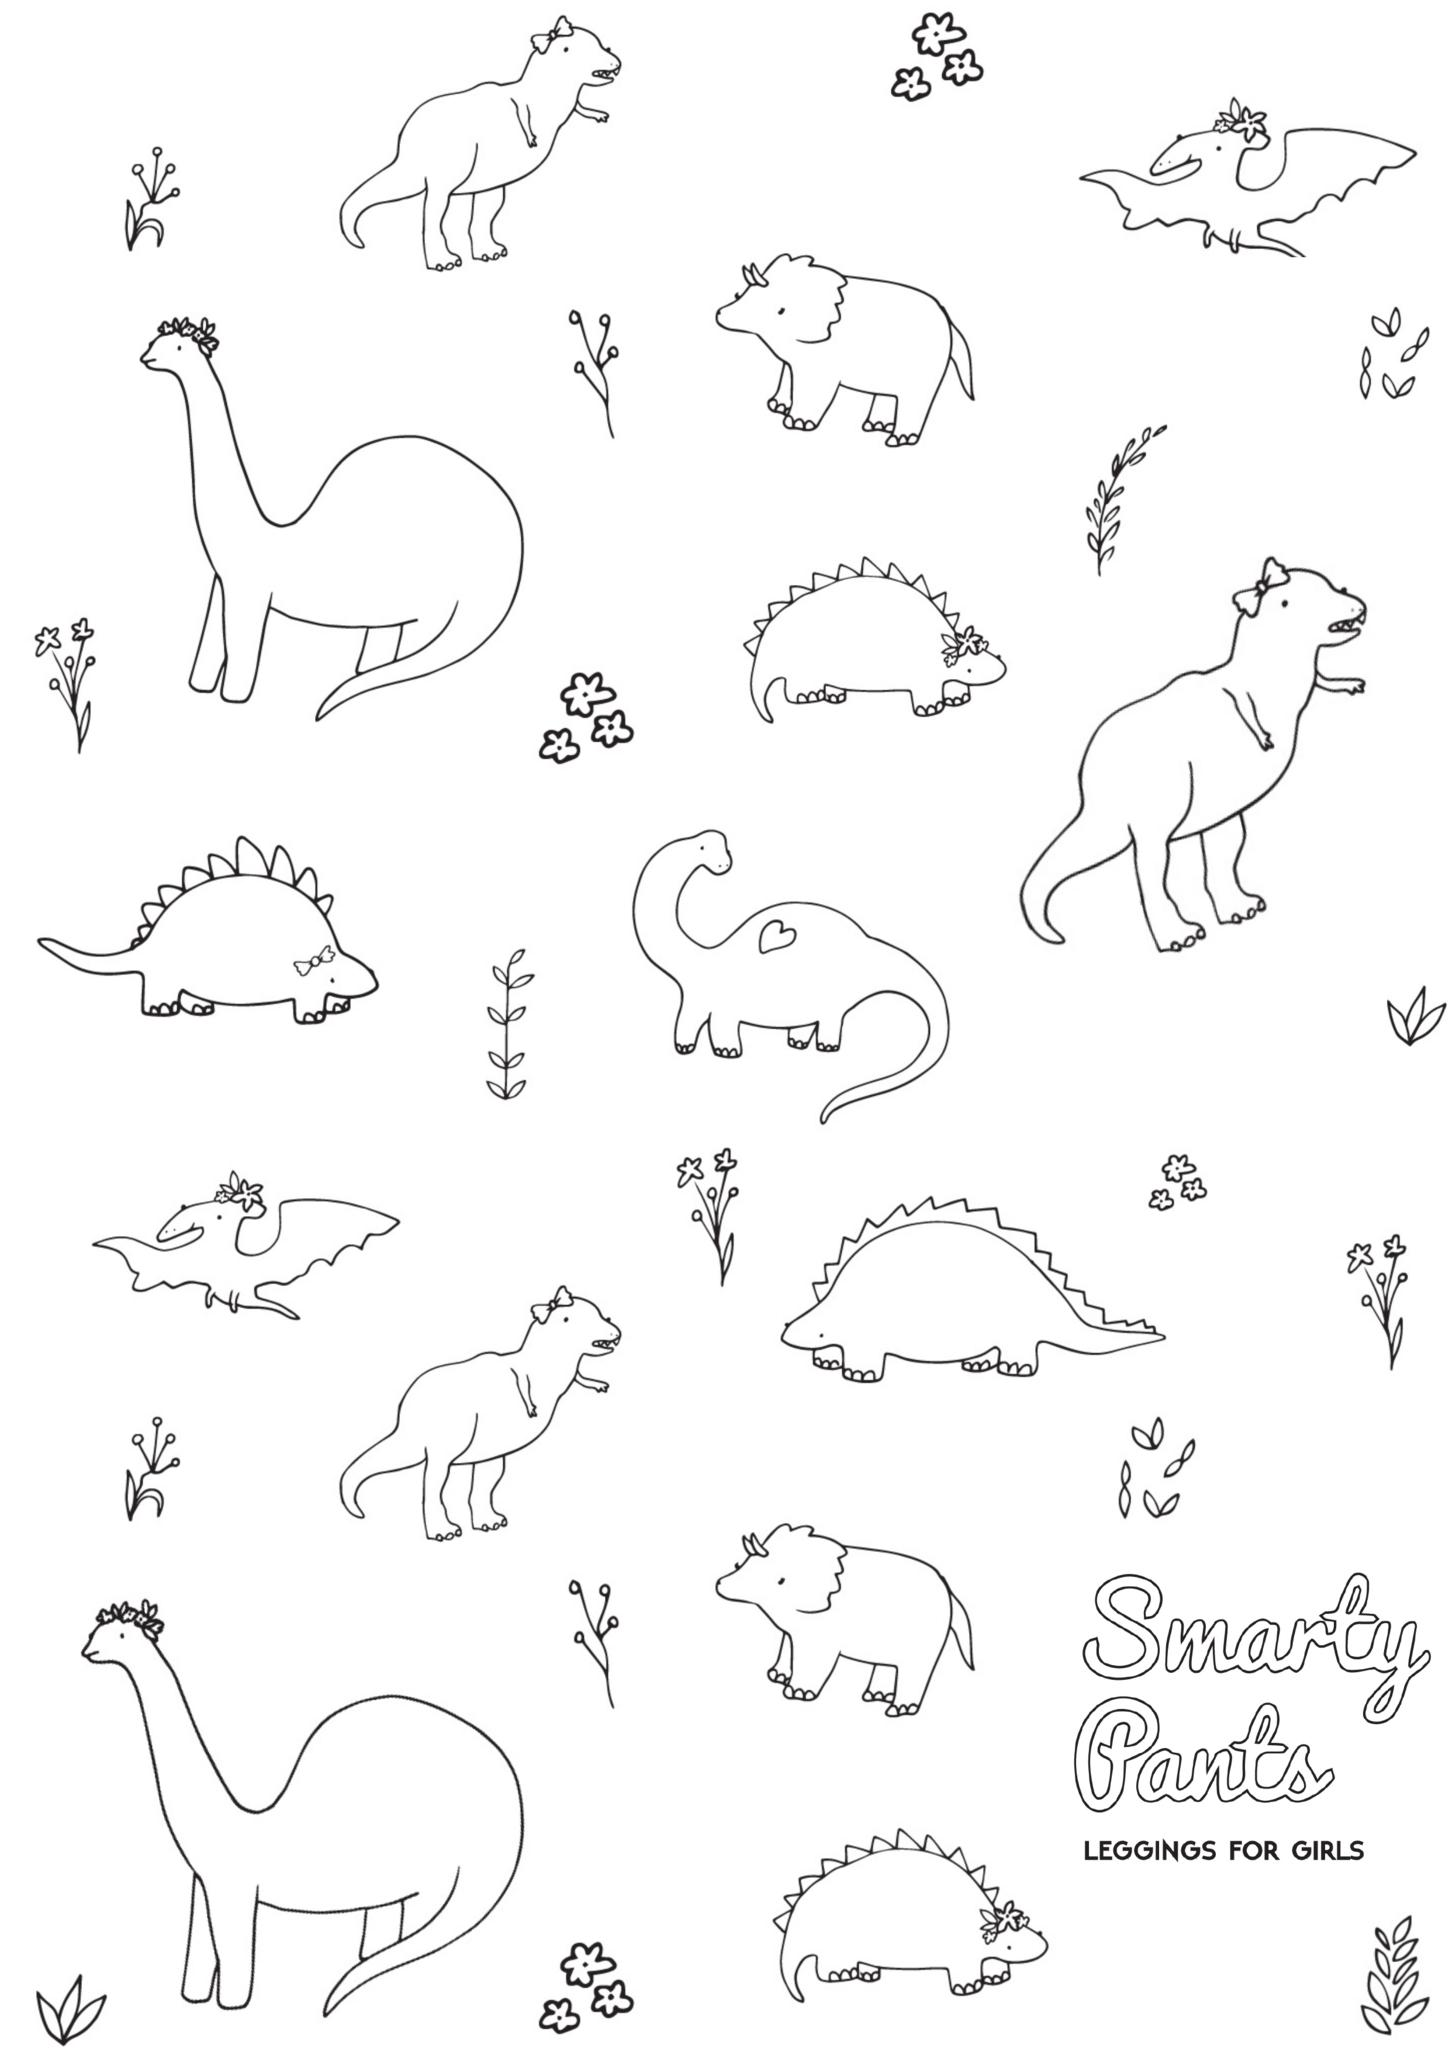 Printable Dinosaur Coloring Page | Smarty Pants Toddler Girl - Free Printable Dinosaur Coloring Pages